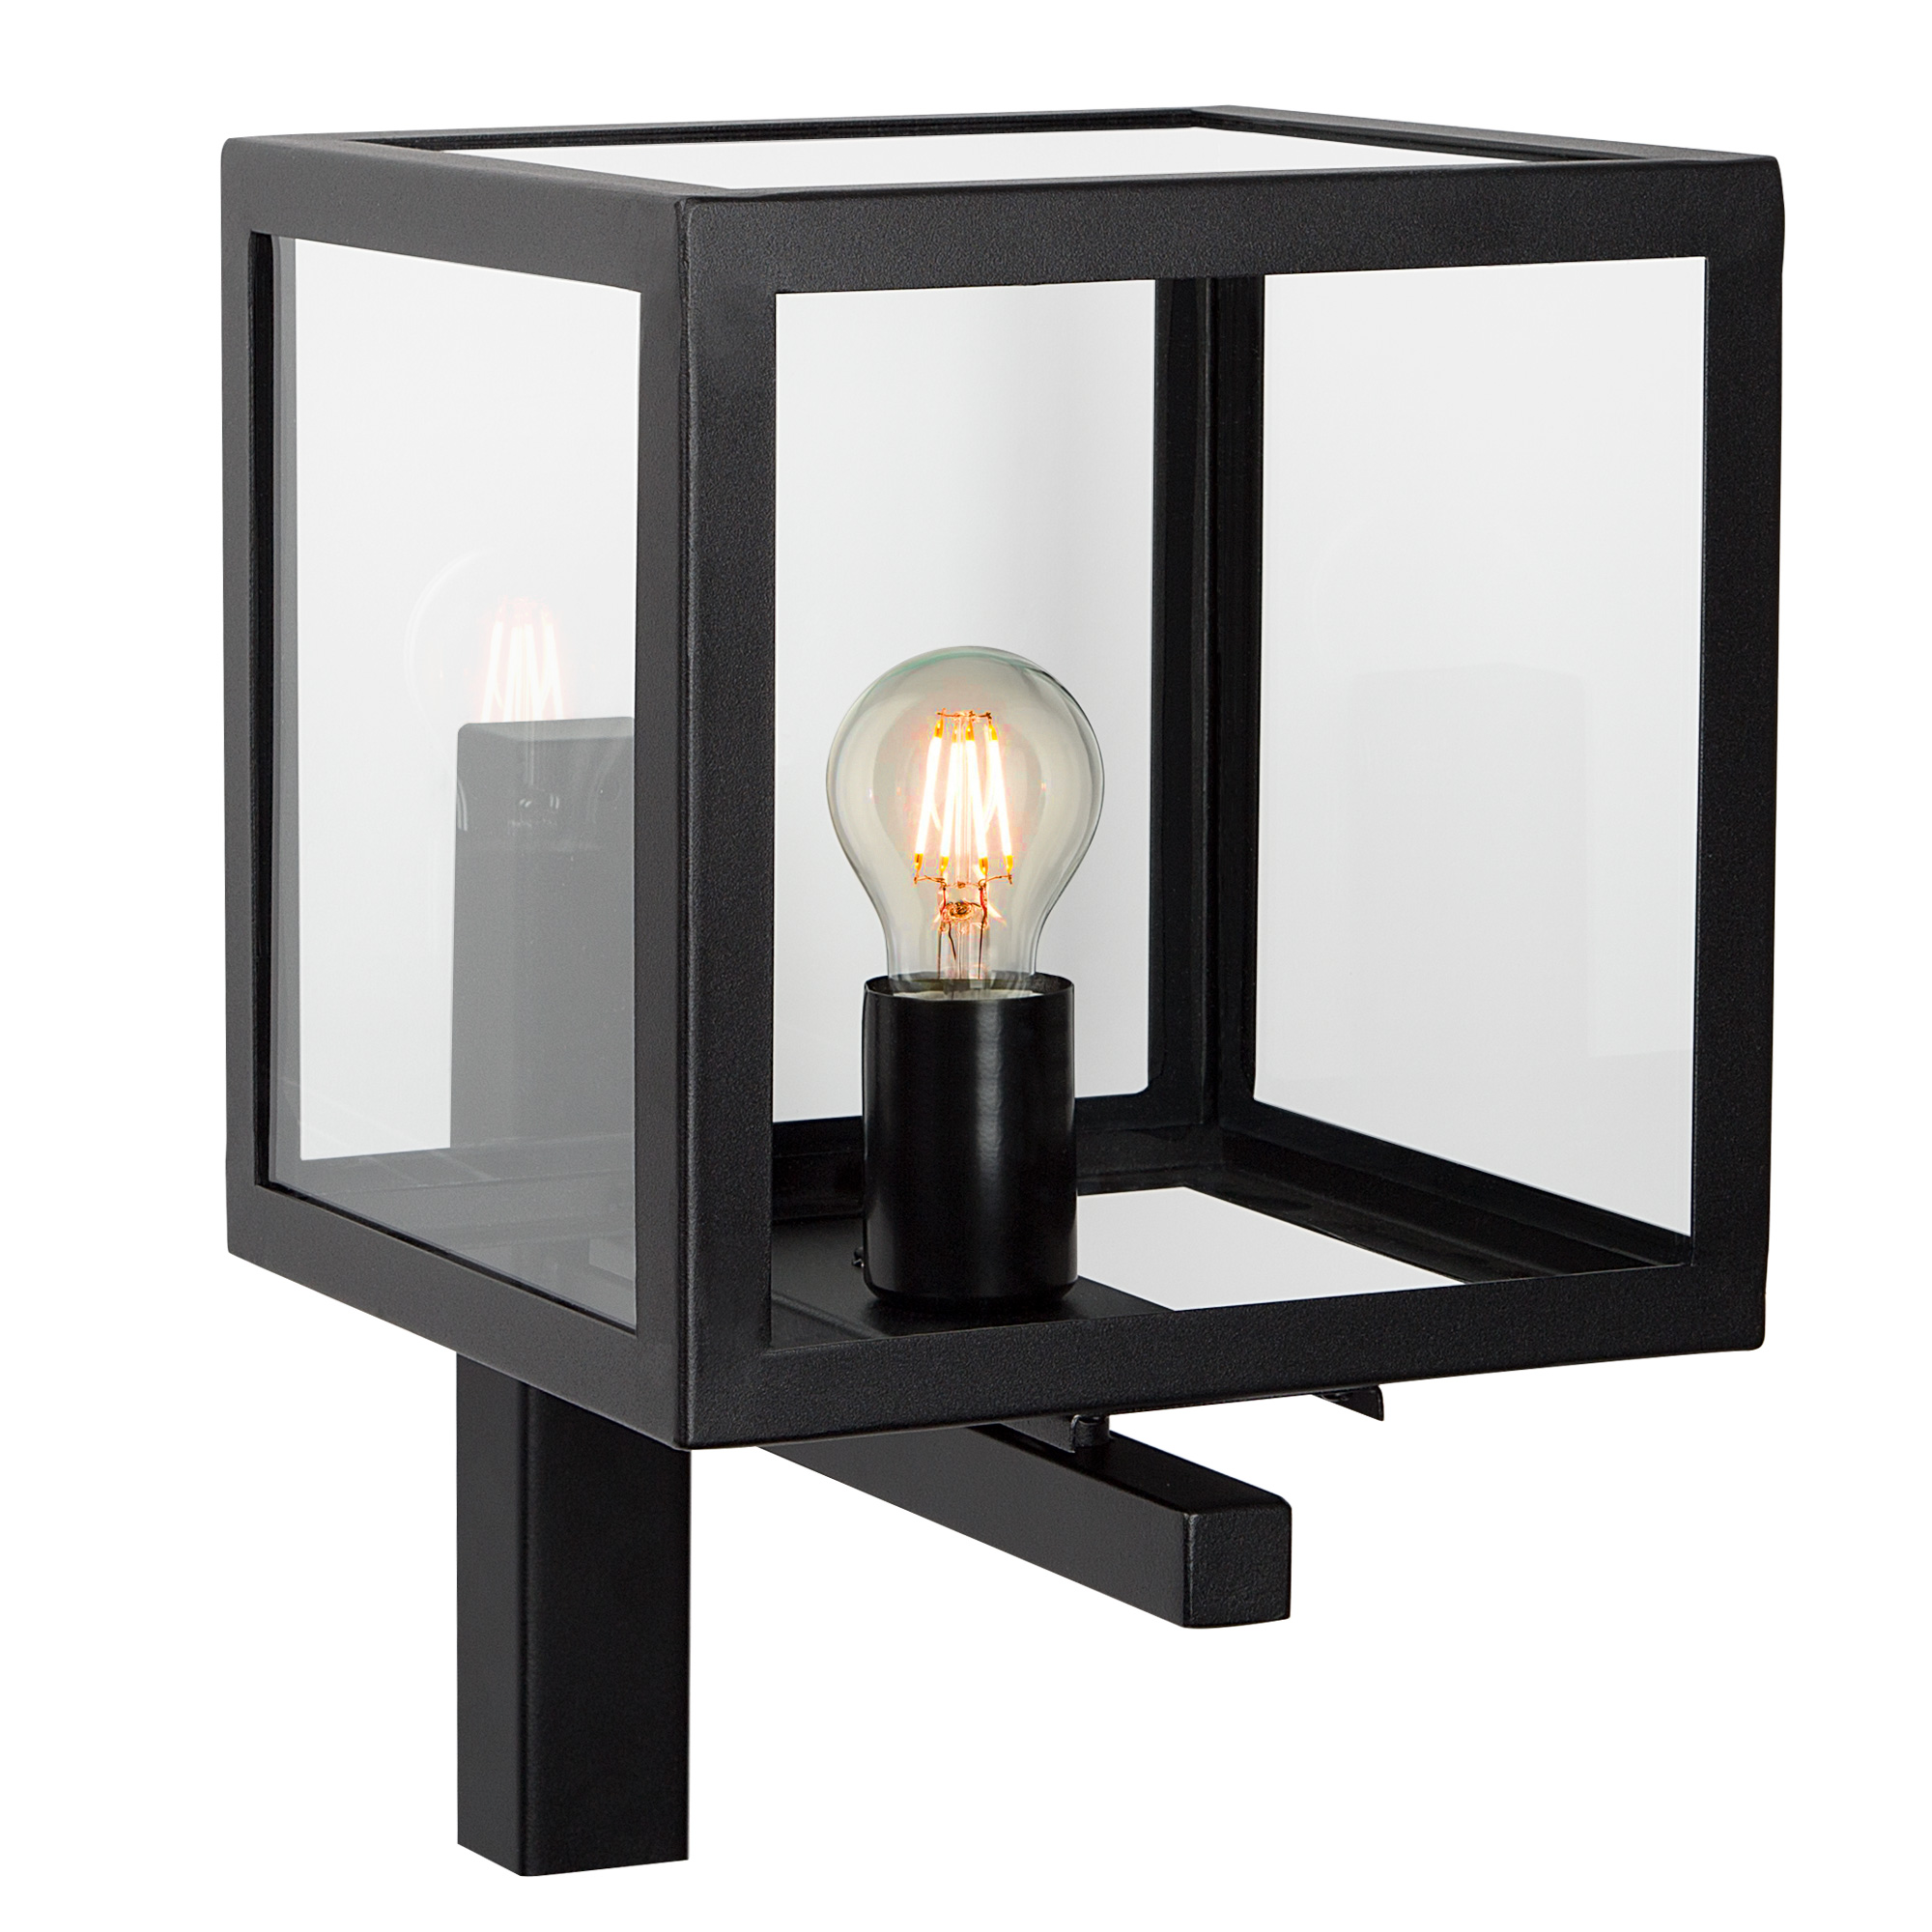 Buitenlamp Loosdrecht Zwart